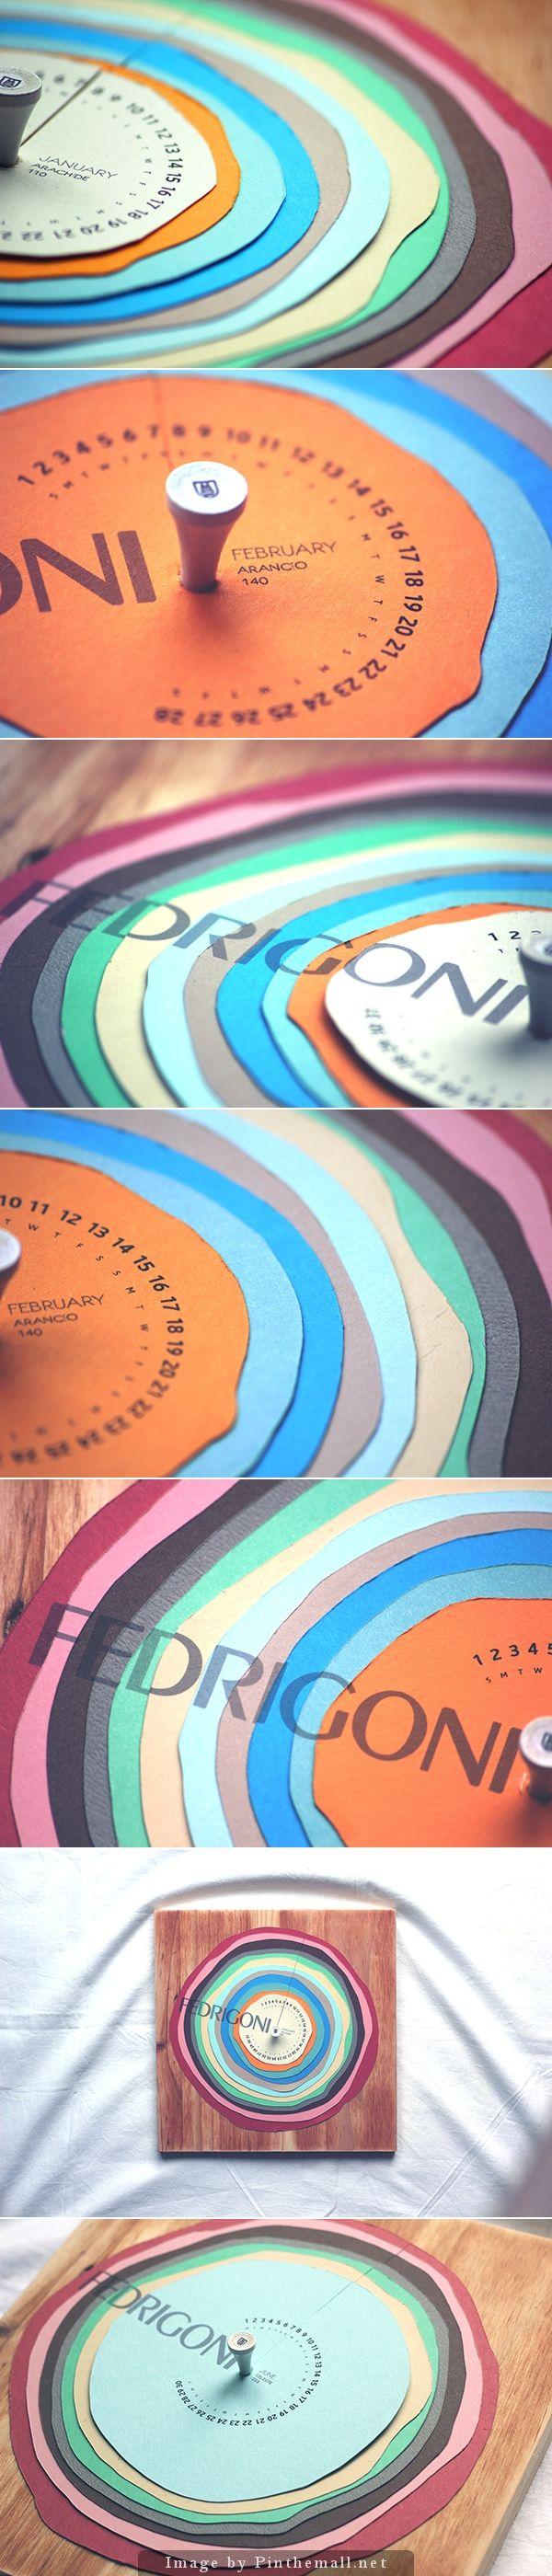 Fedrigoni 2015 Calendar by Christopher Hoare